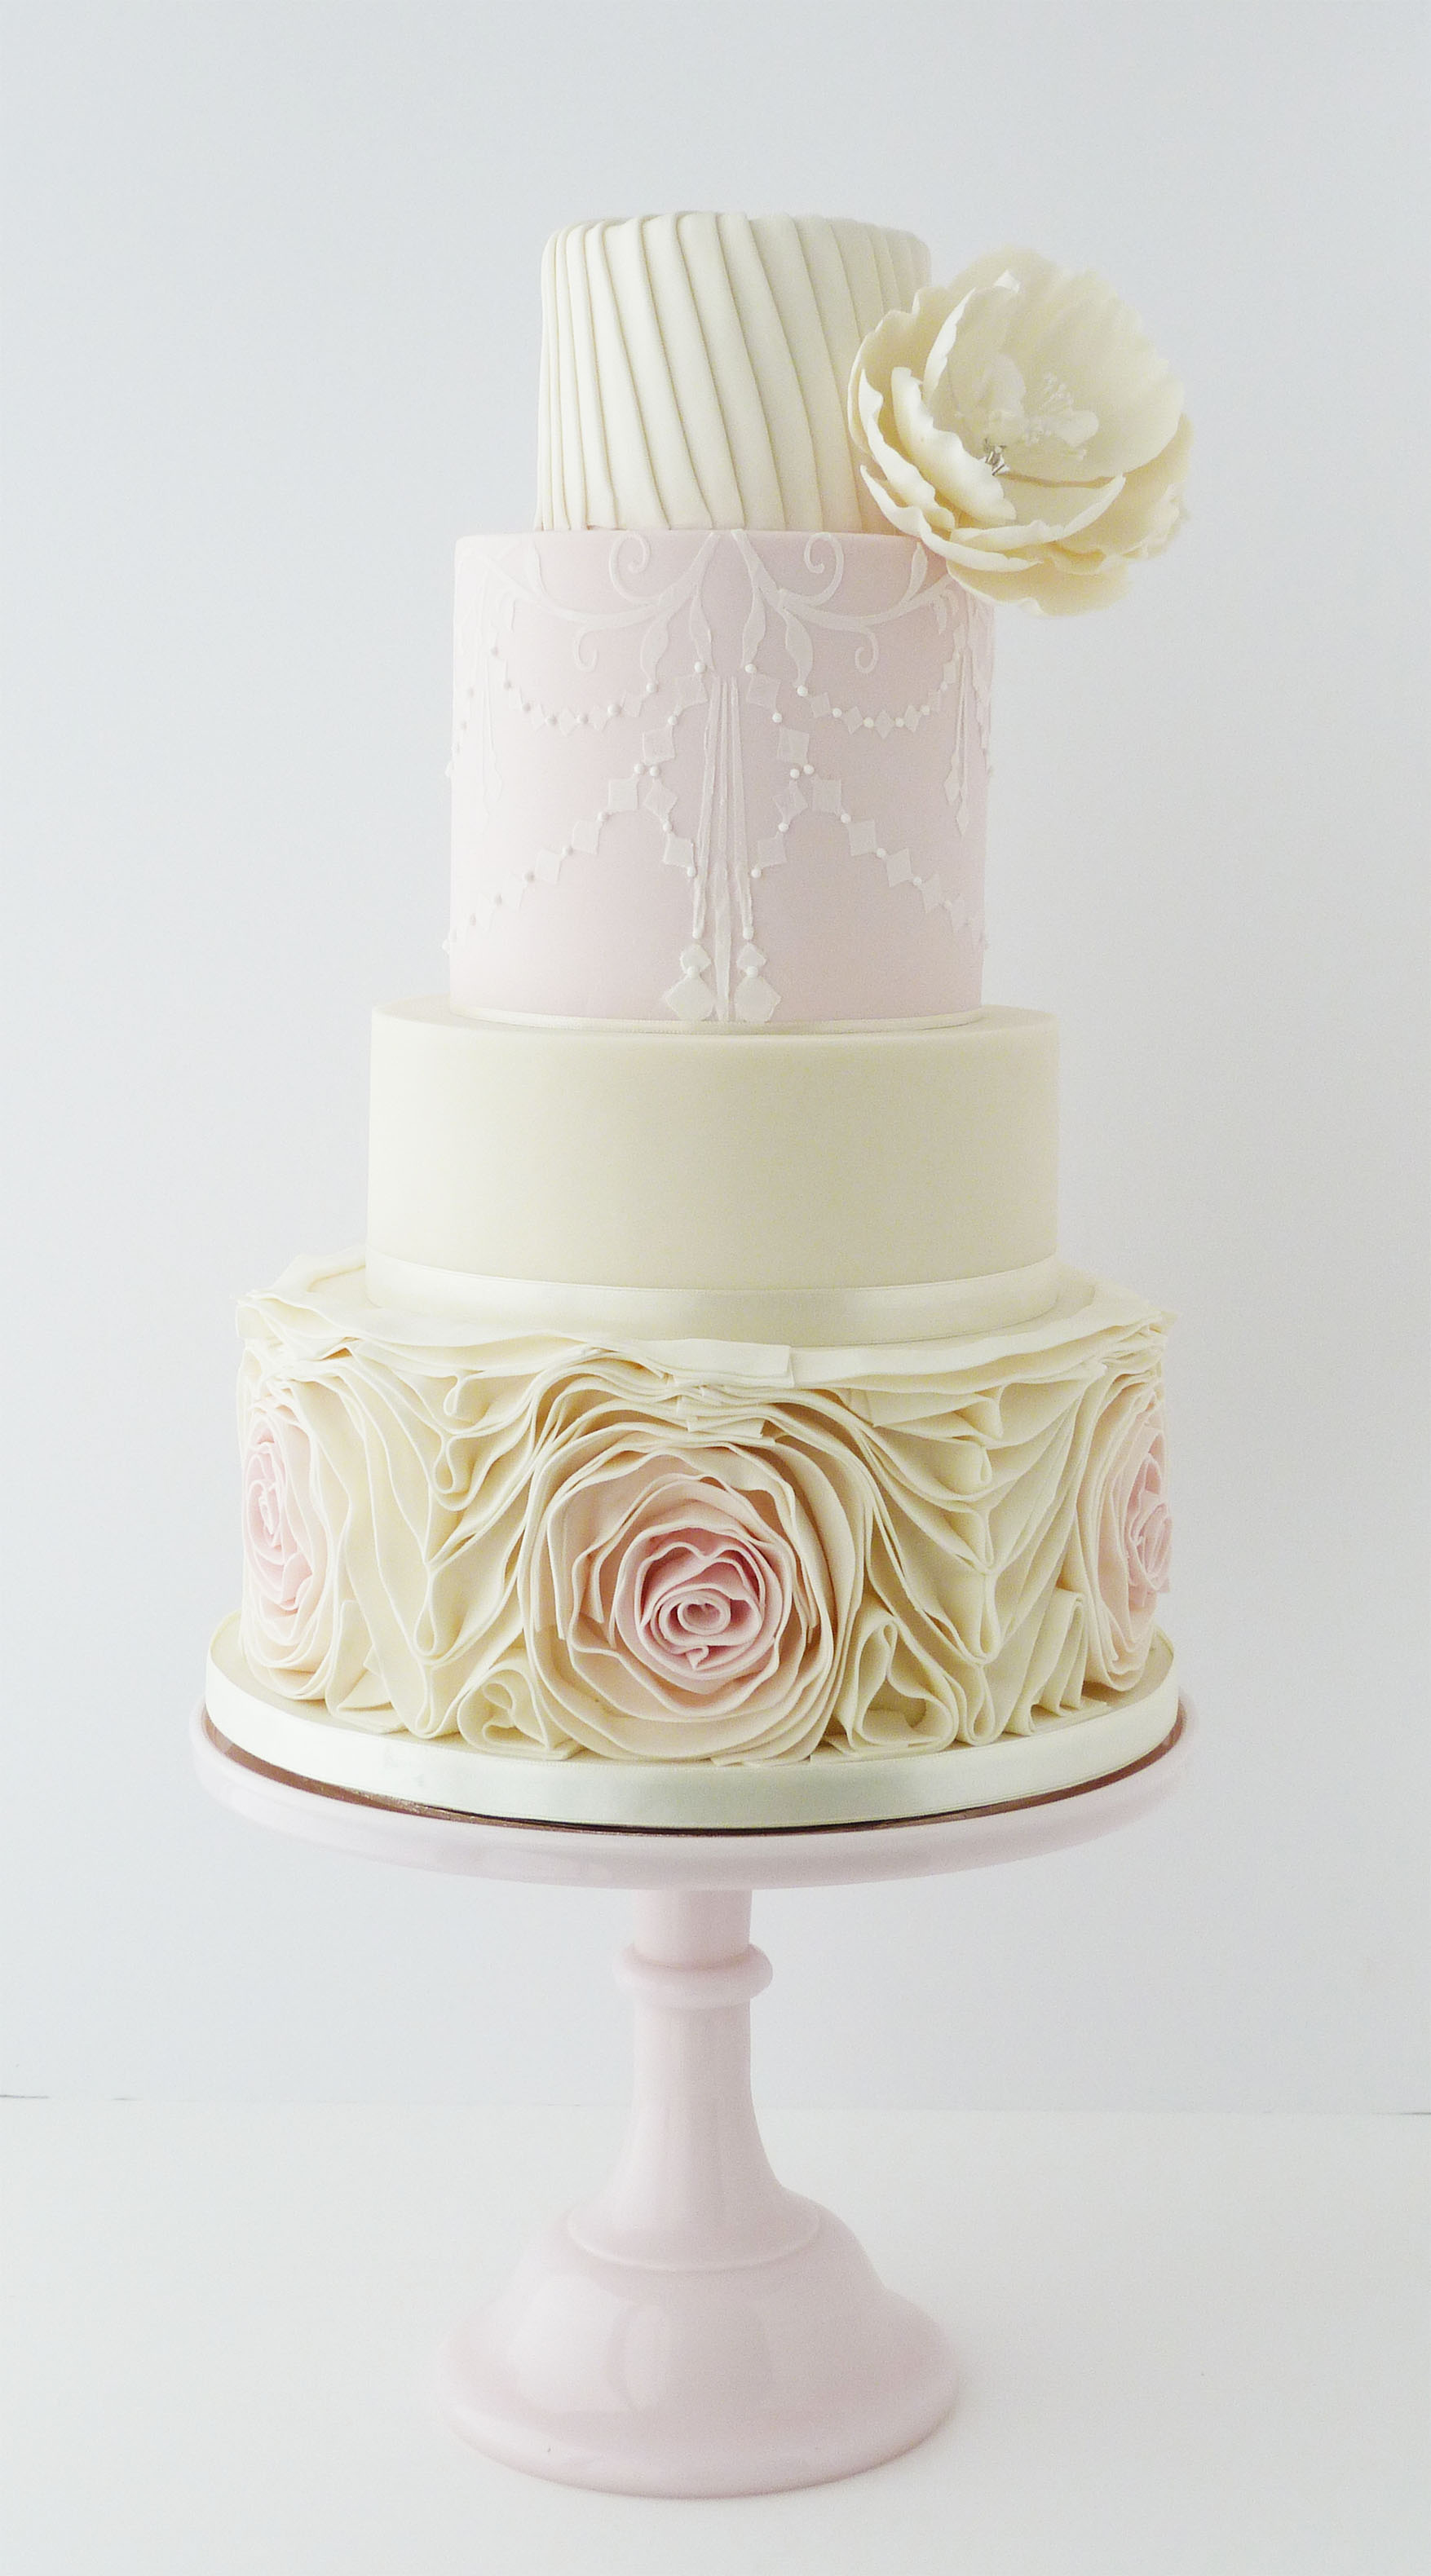 Eleanor and Hugh ruffle cake.jpg